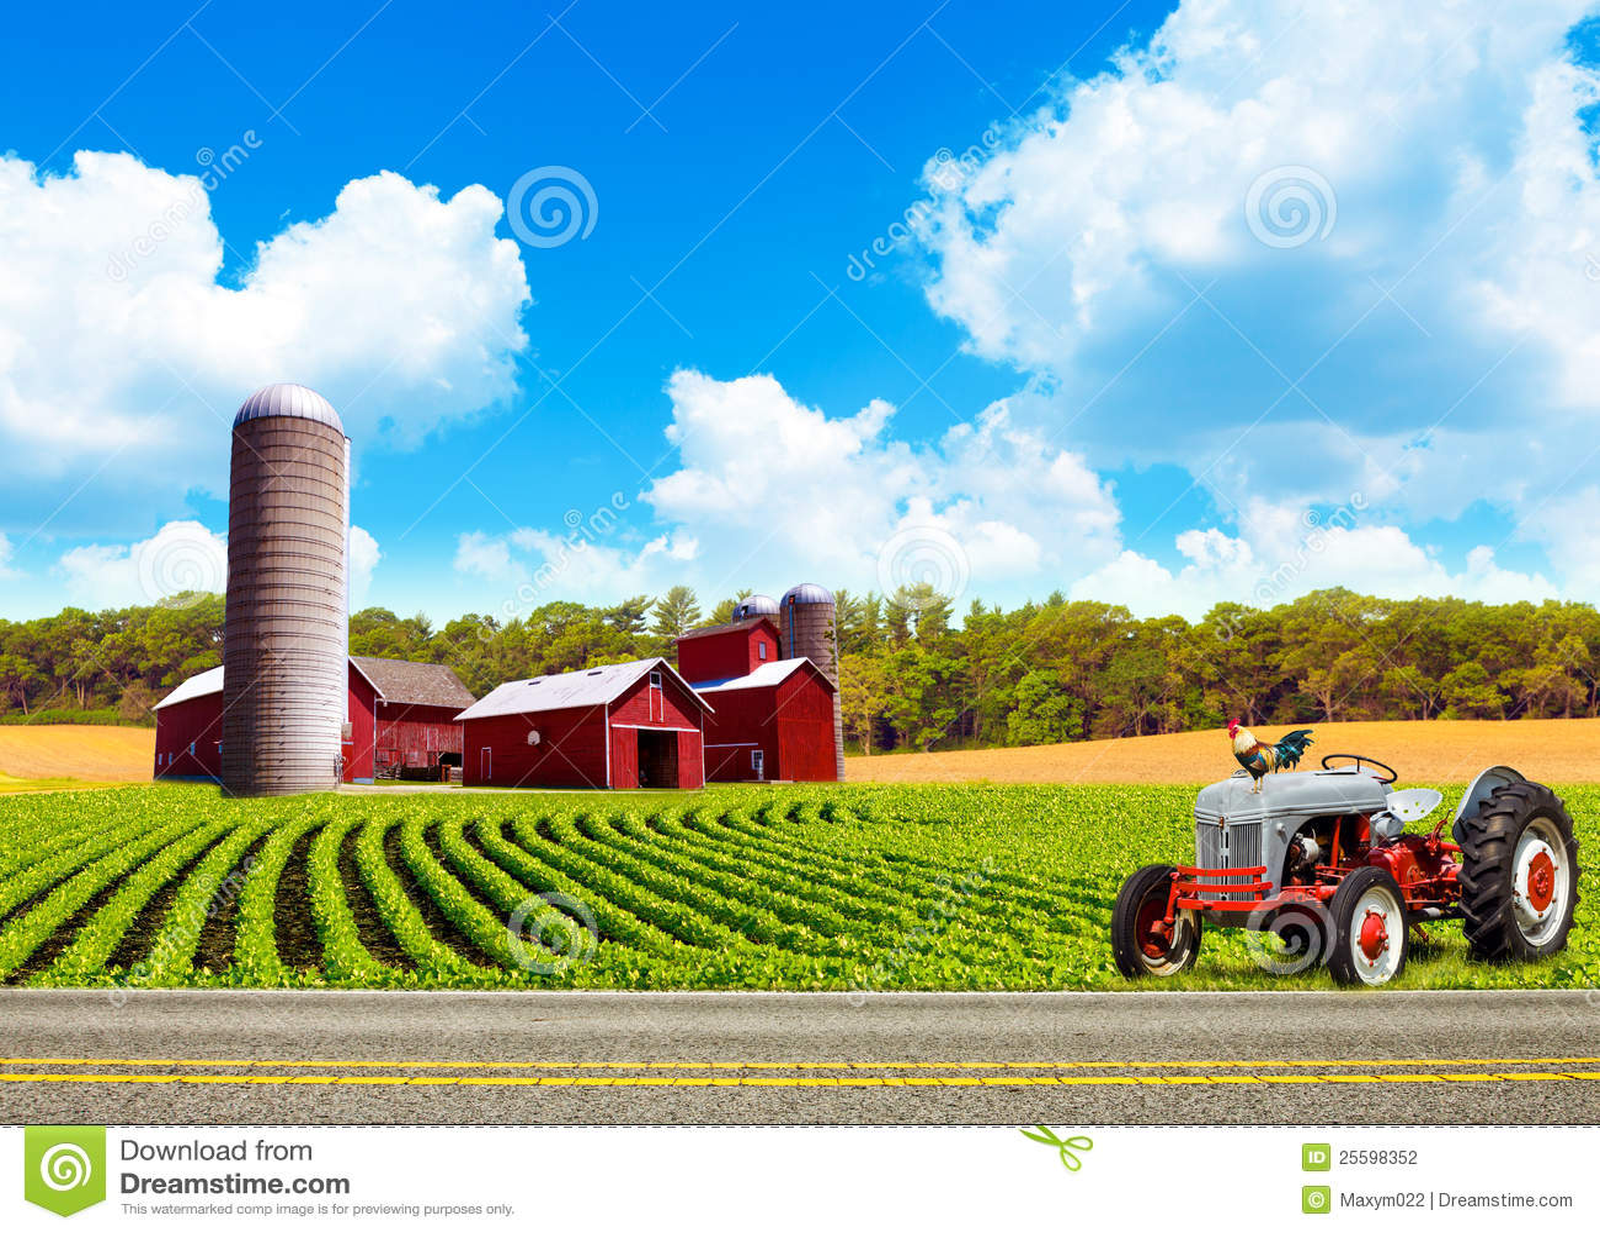 Country Farm Landscape